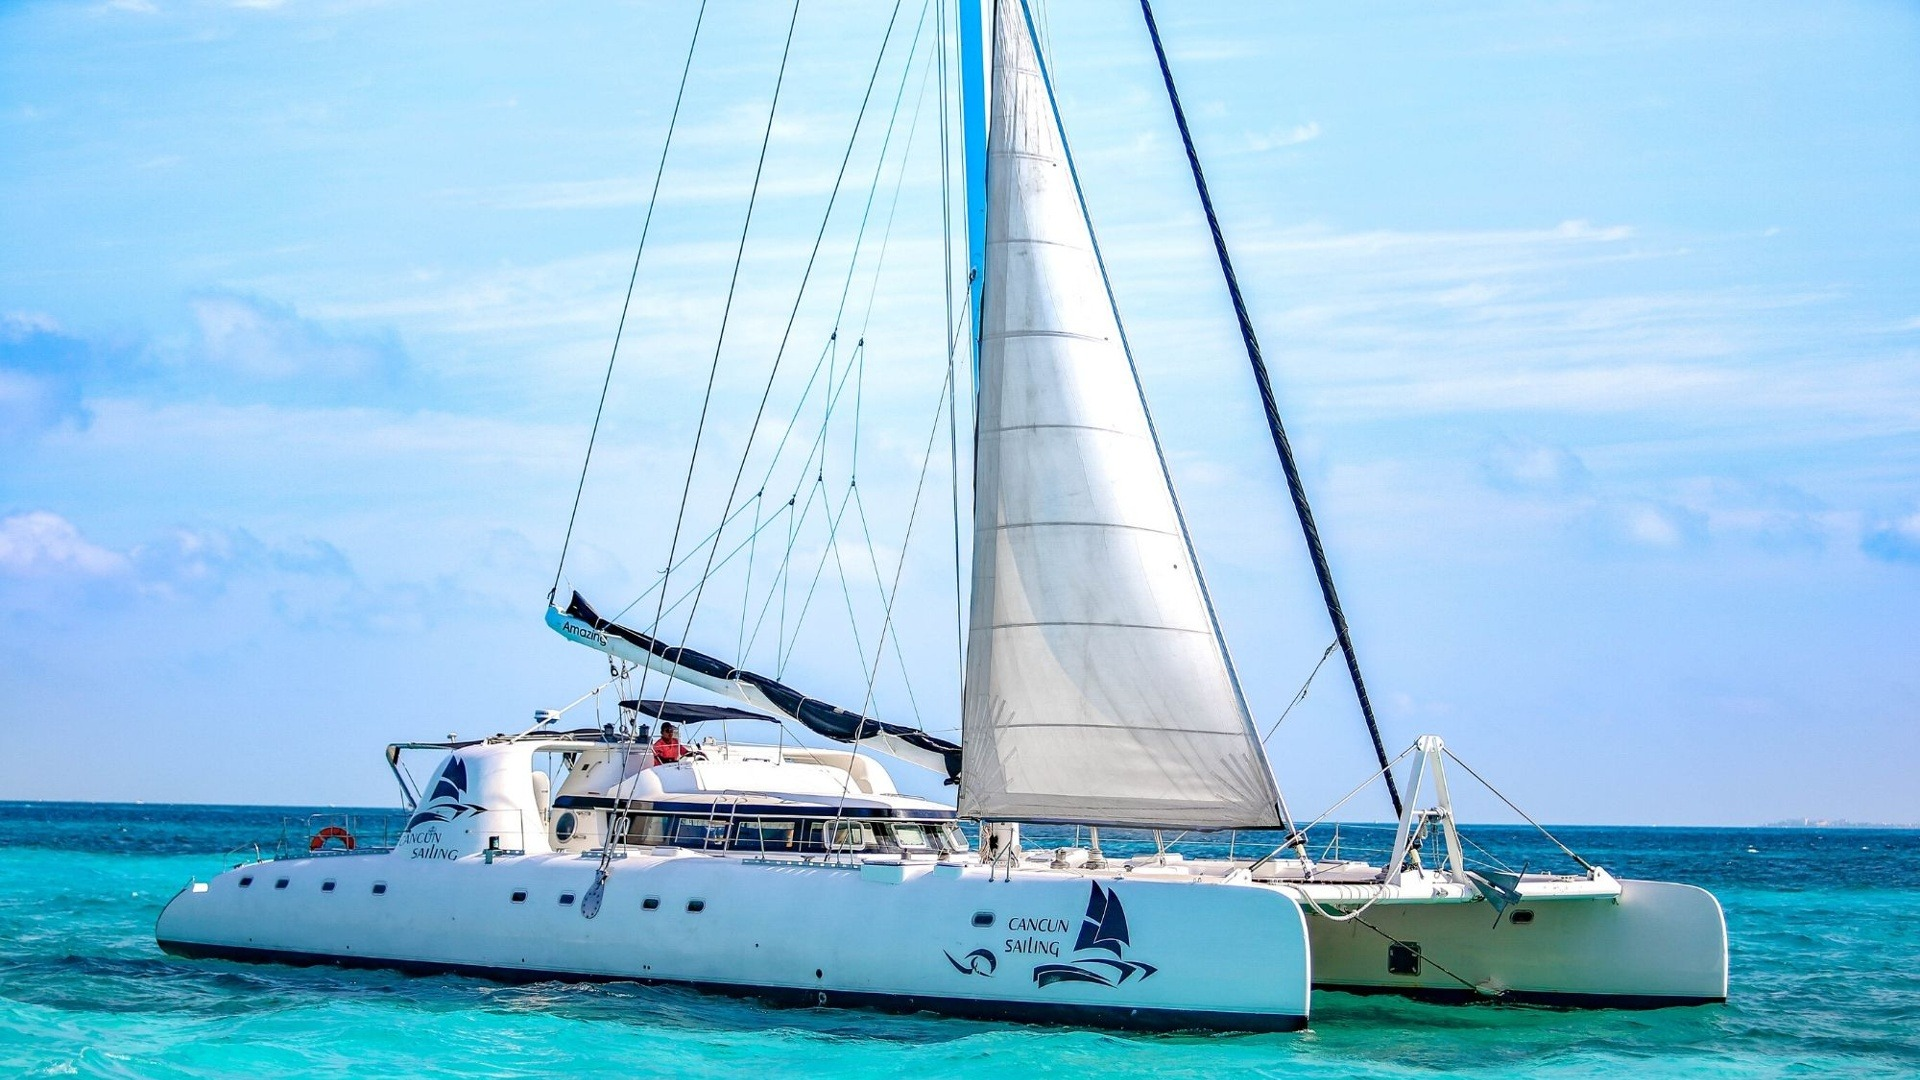 6 - LoRes - Amazing - Isla Mujeres Catamaran Tour - Cancun Sailing